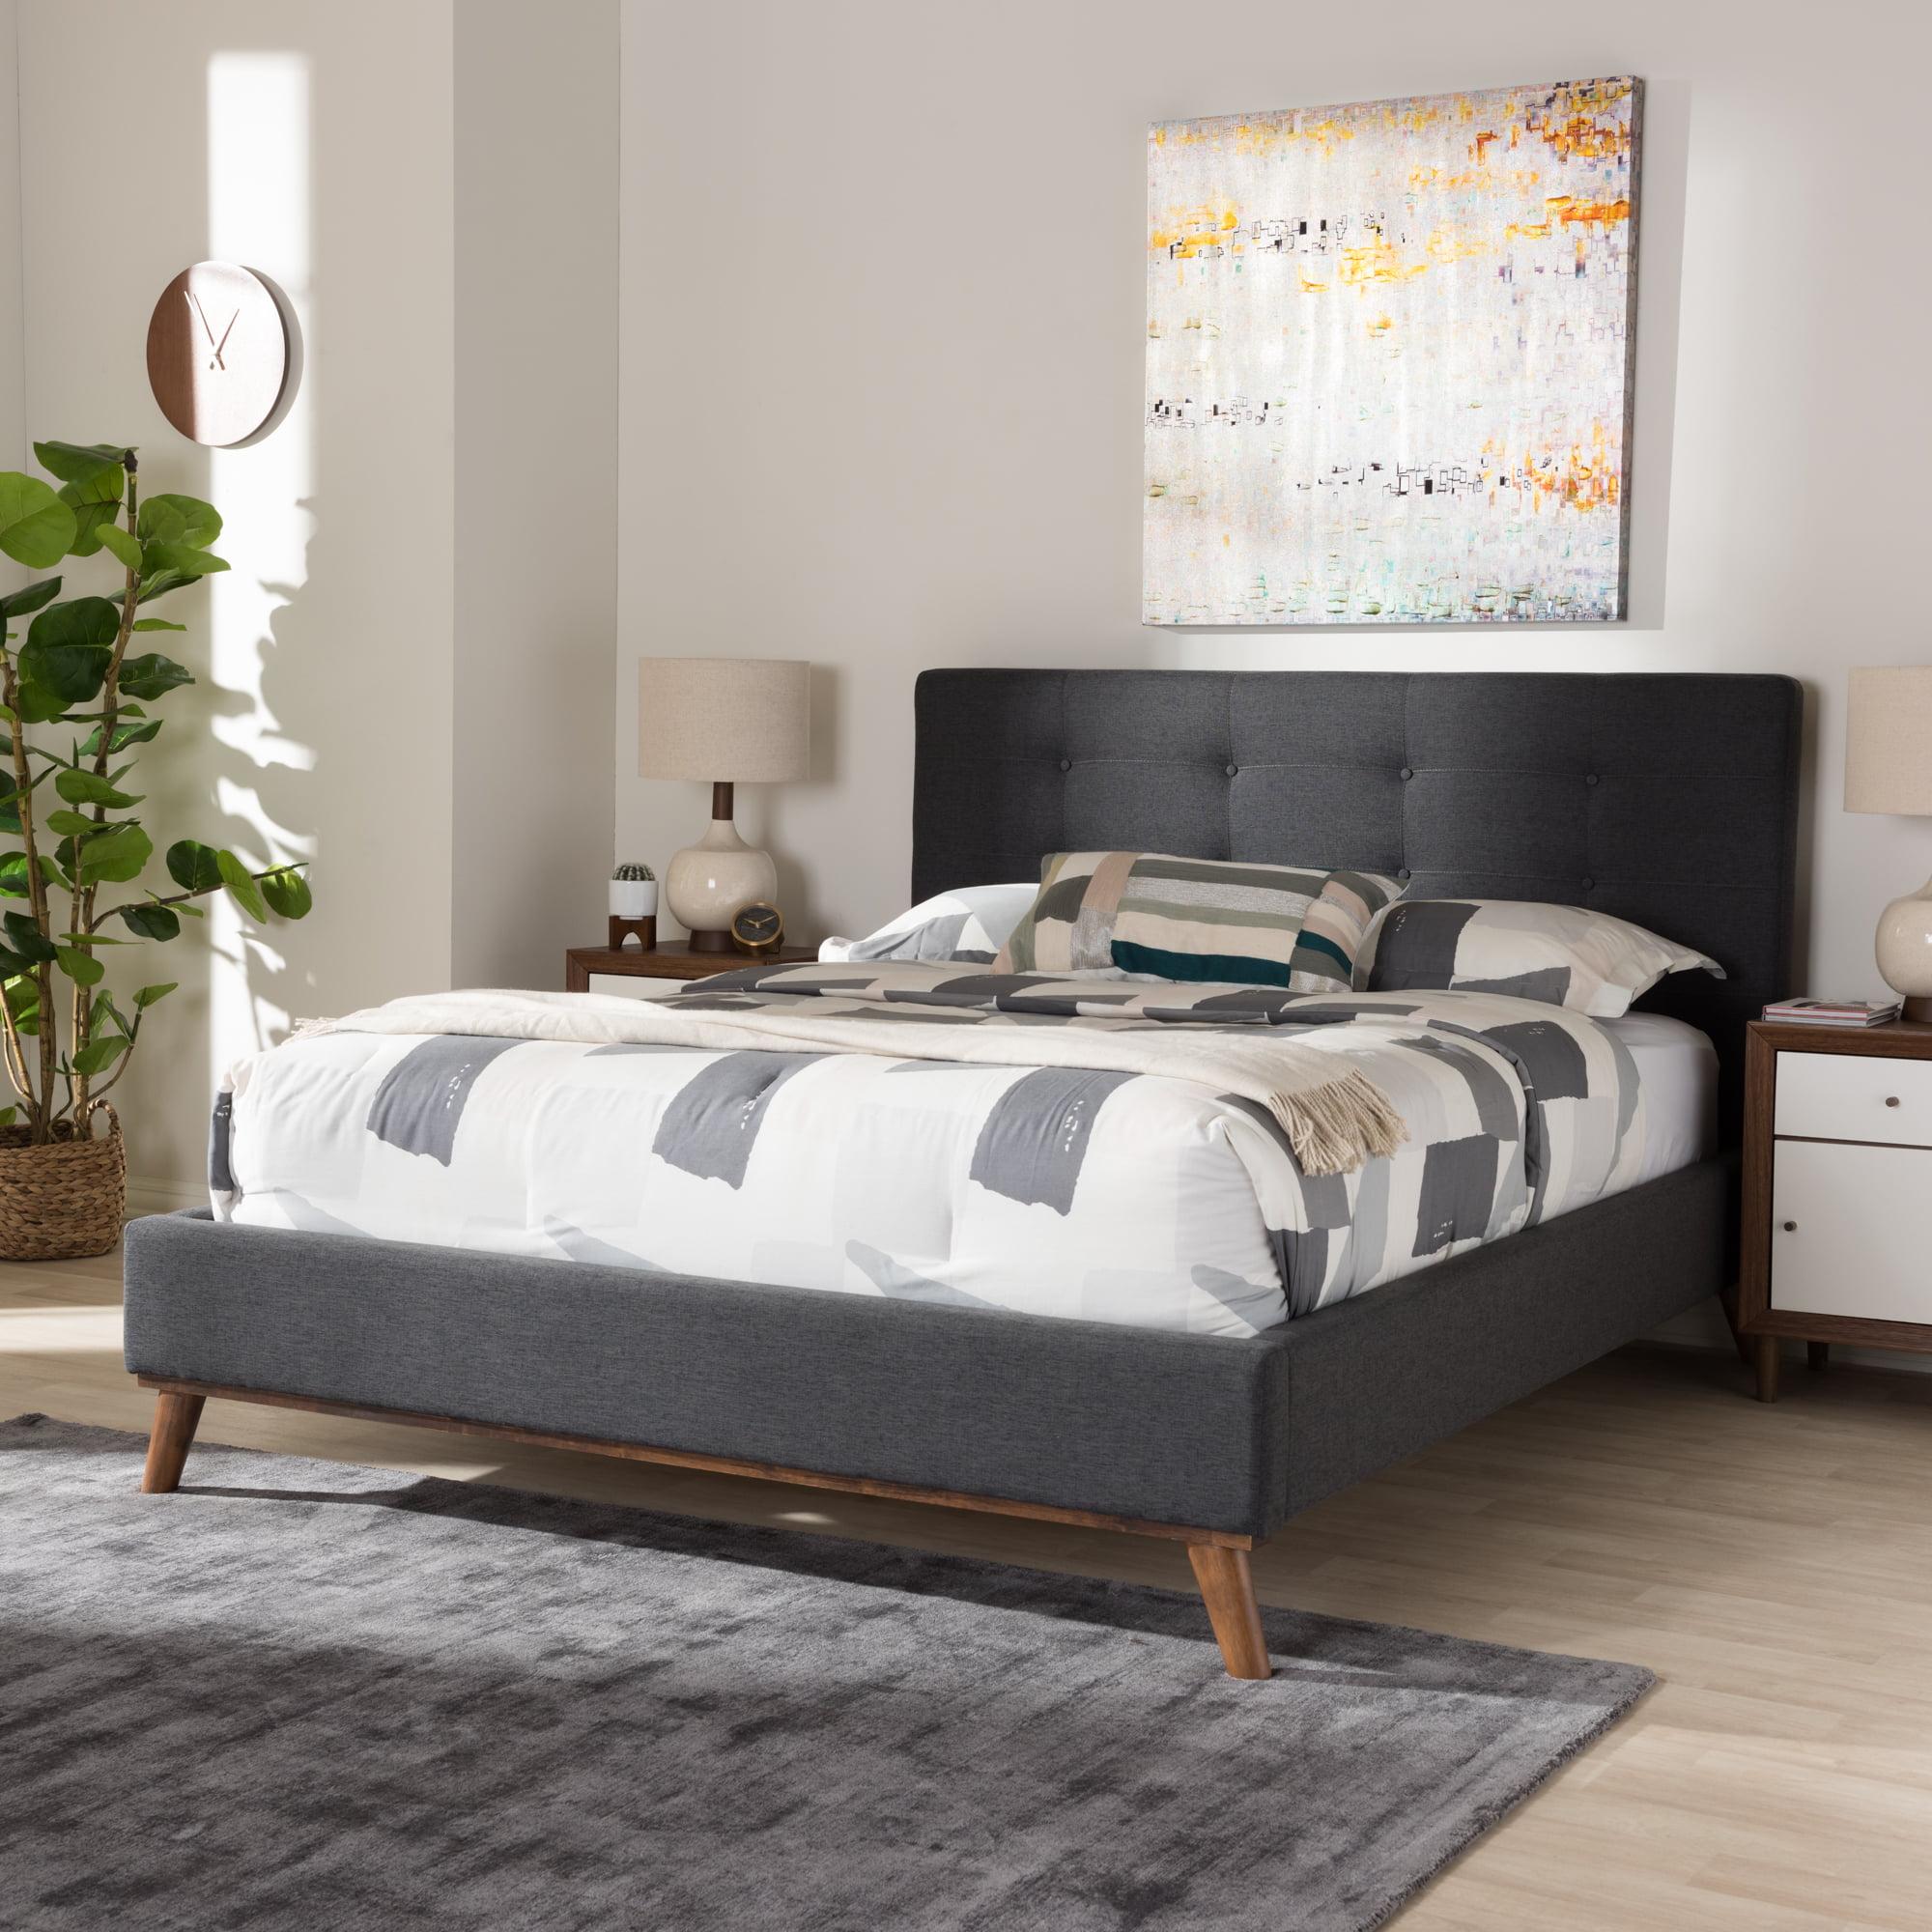 Baxton Studio Valencia Mid-Century Modern Dark Gray Fabric King Size Platform Bed